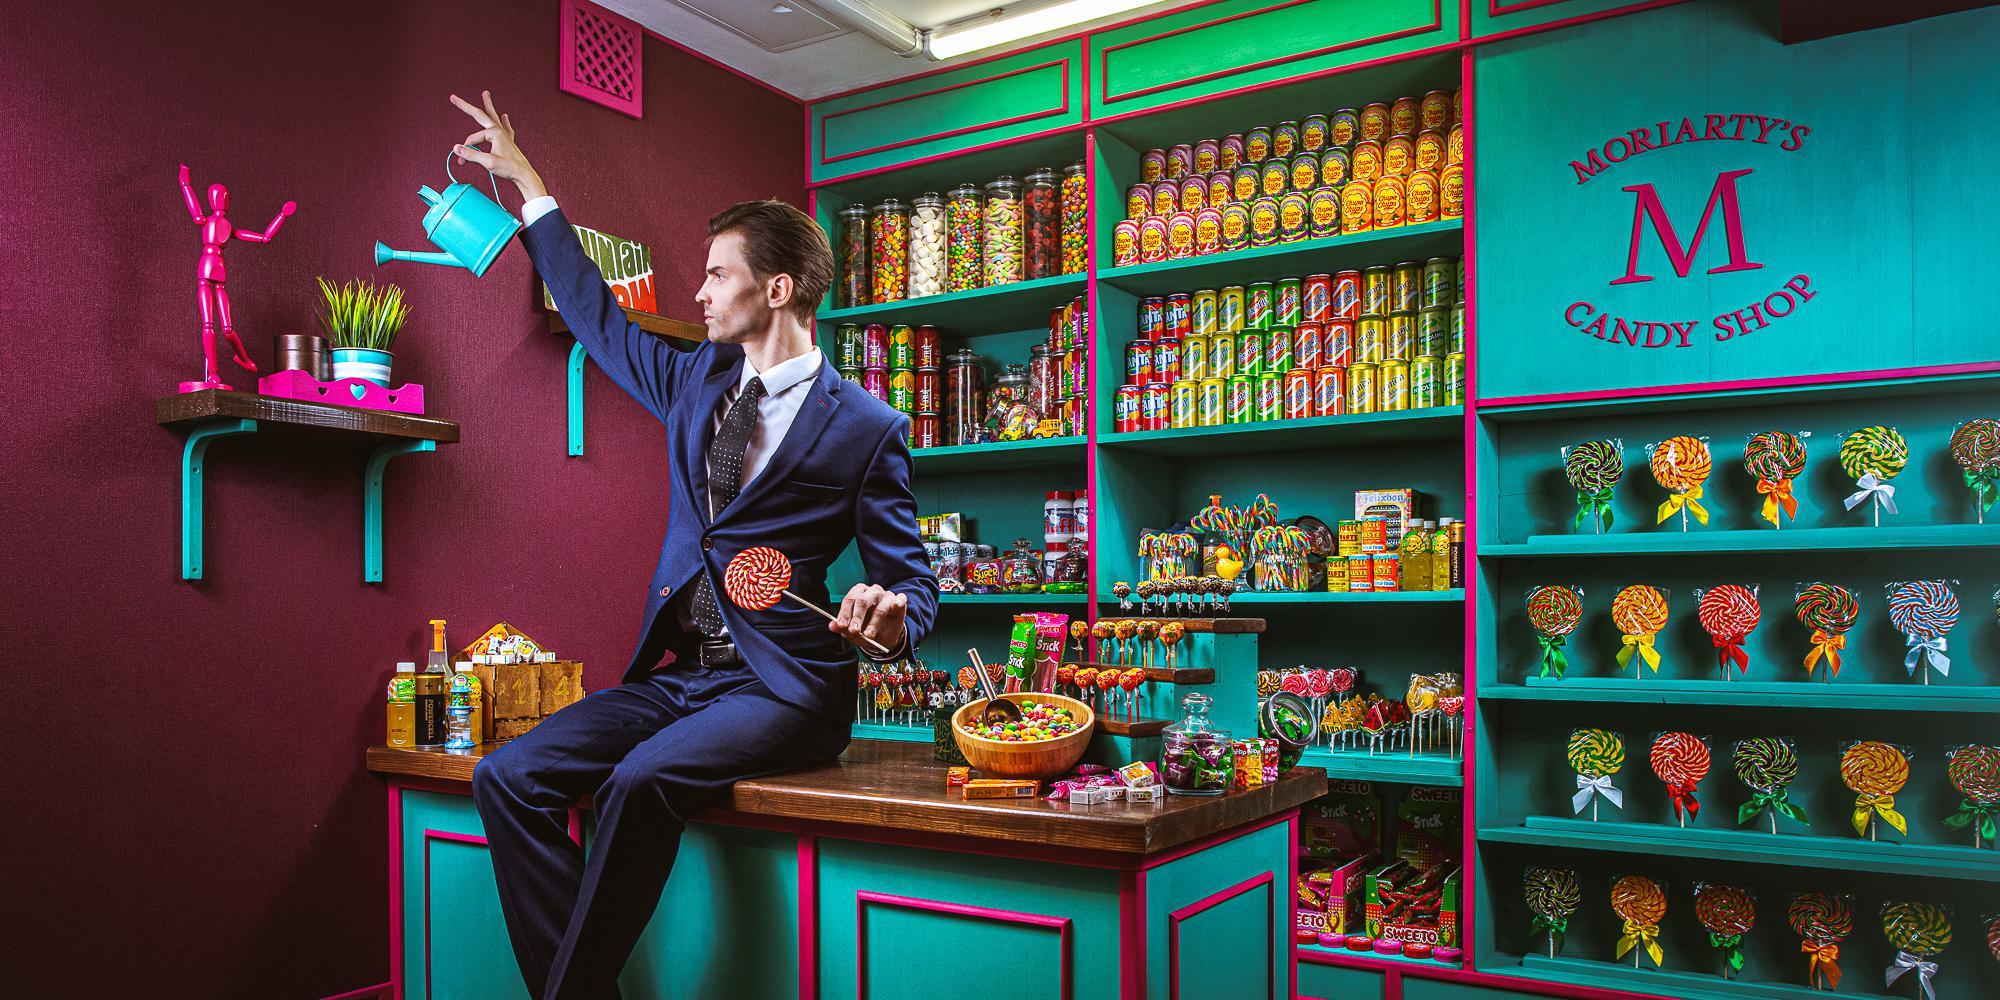 Фотография квеста «Moriarty`s candy shop»